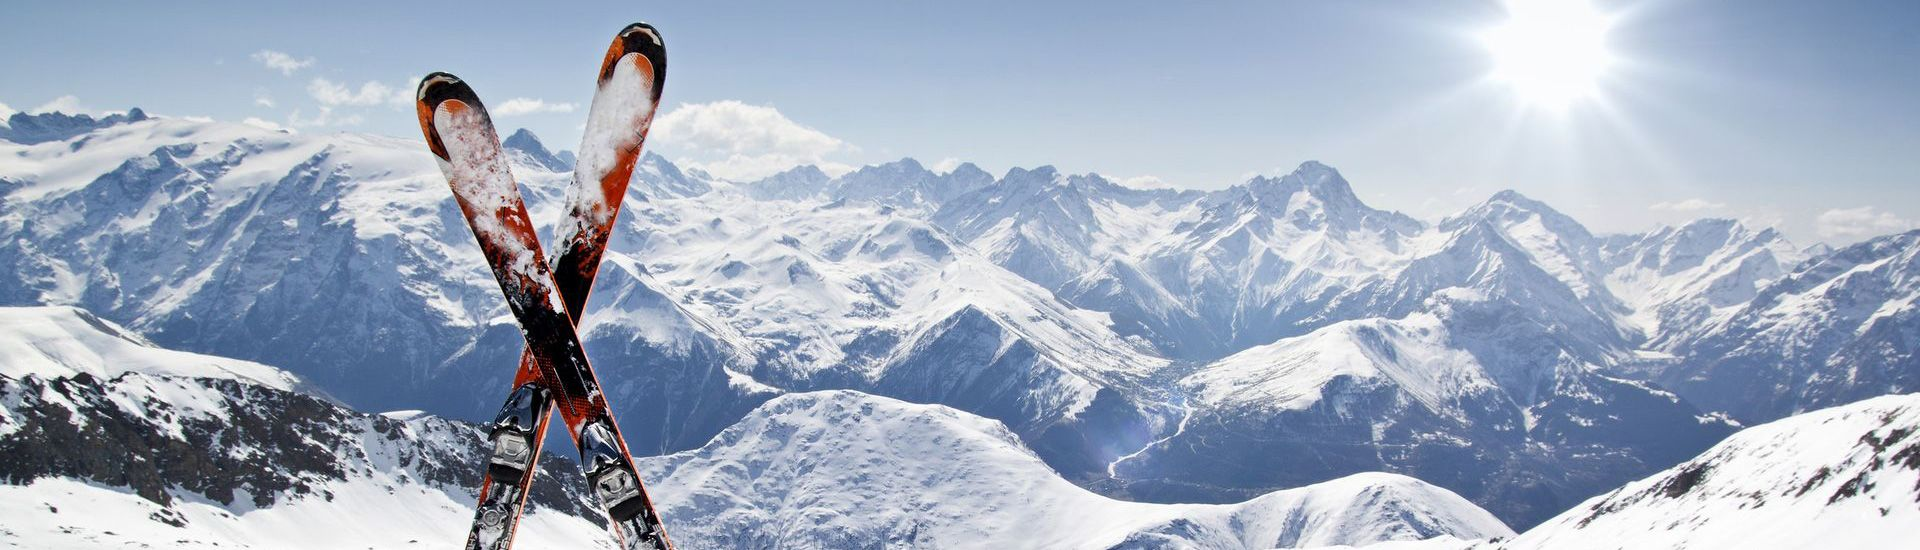 Bildquelle: http://www.lamisoleil.com/de/skiferien